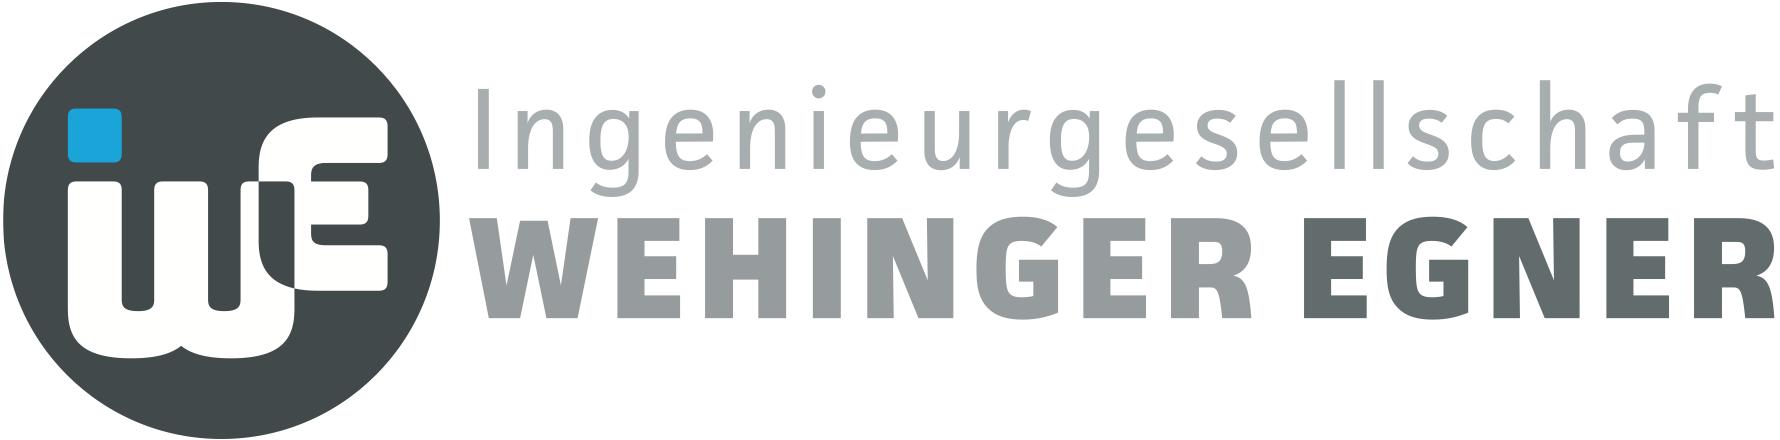 Ingenieurgesellschaft Wehinger Egner mbH